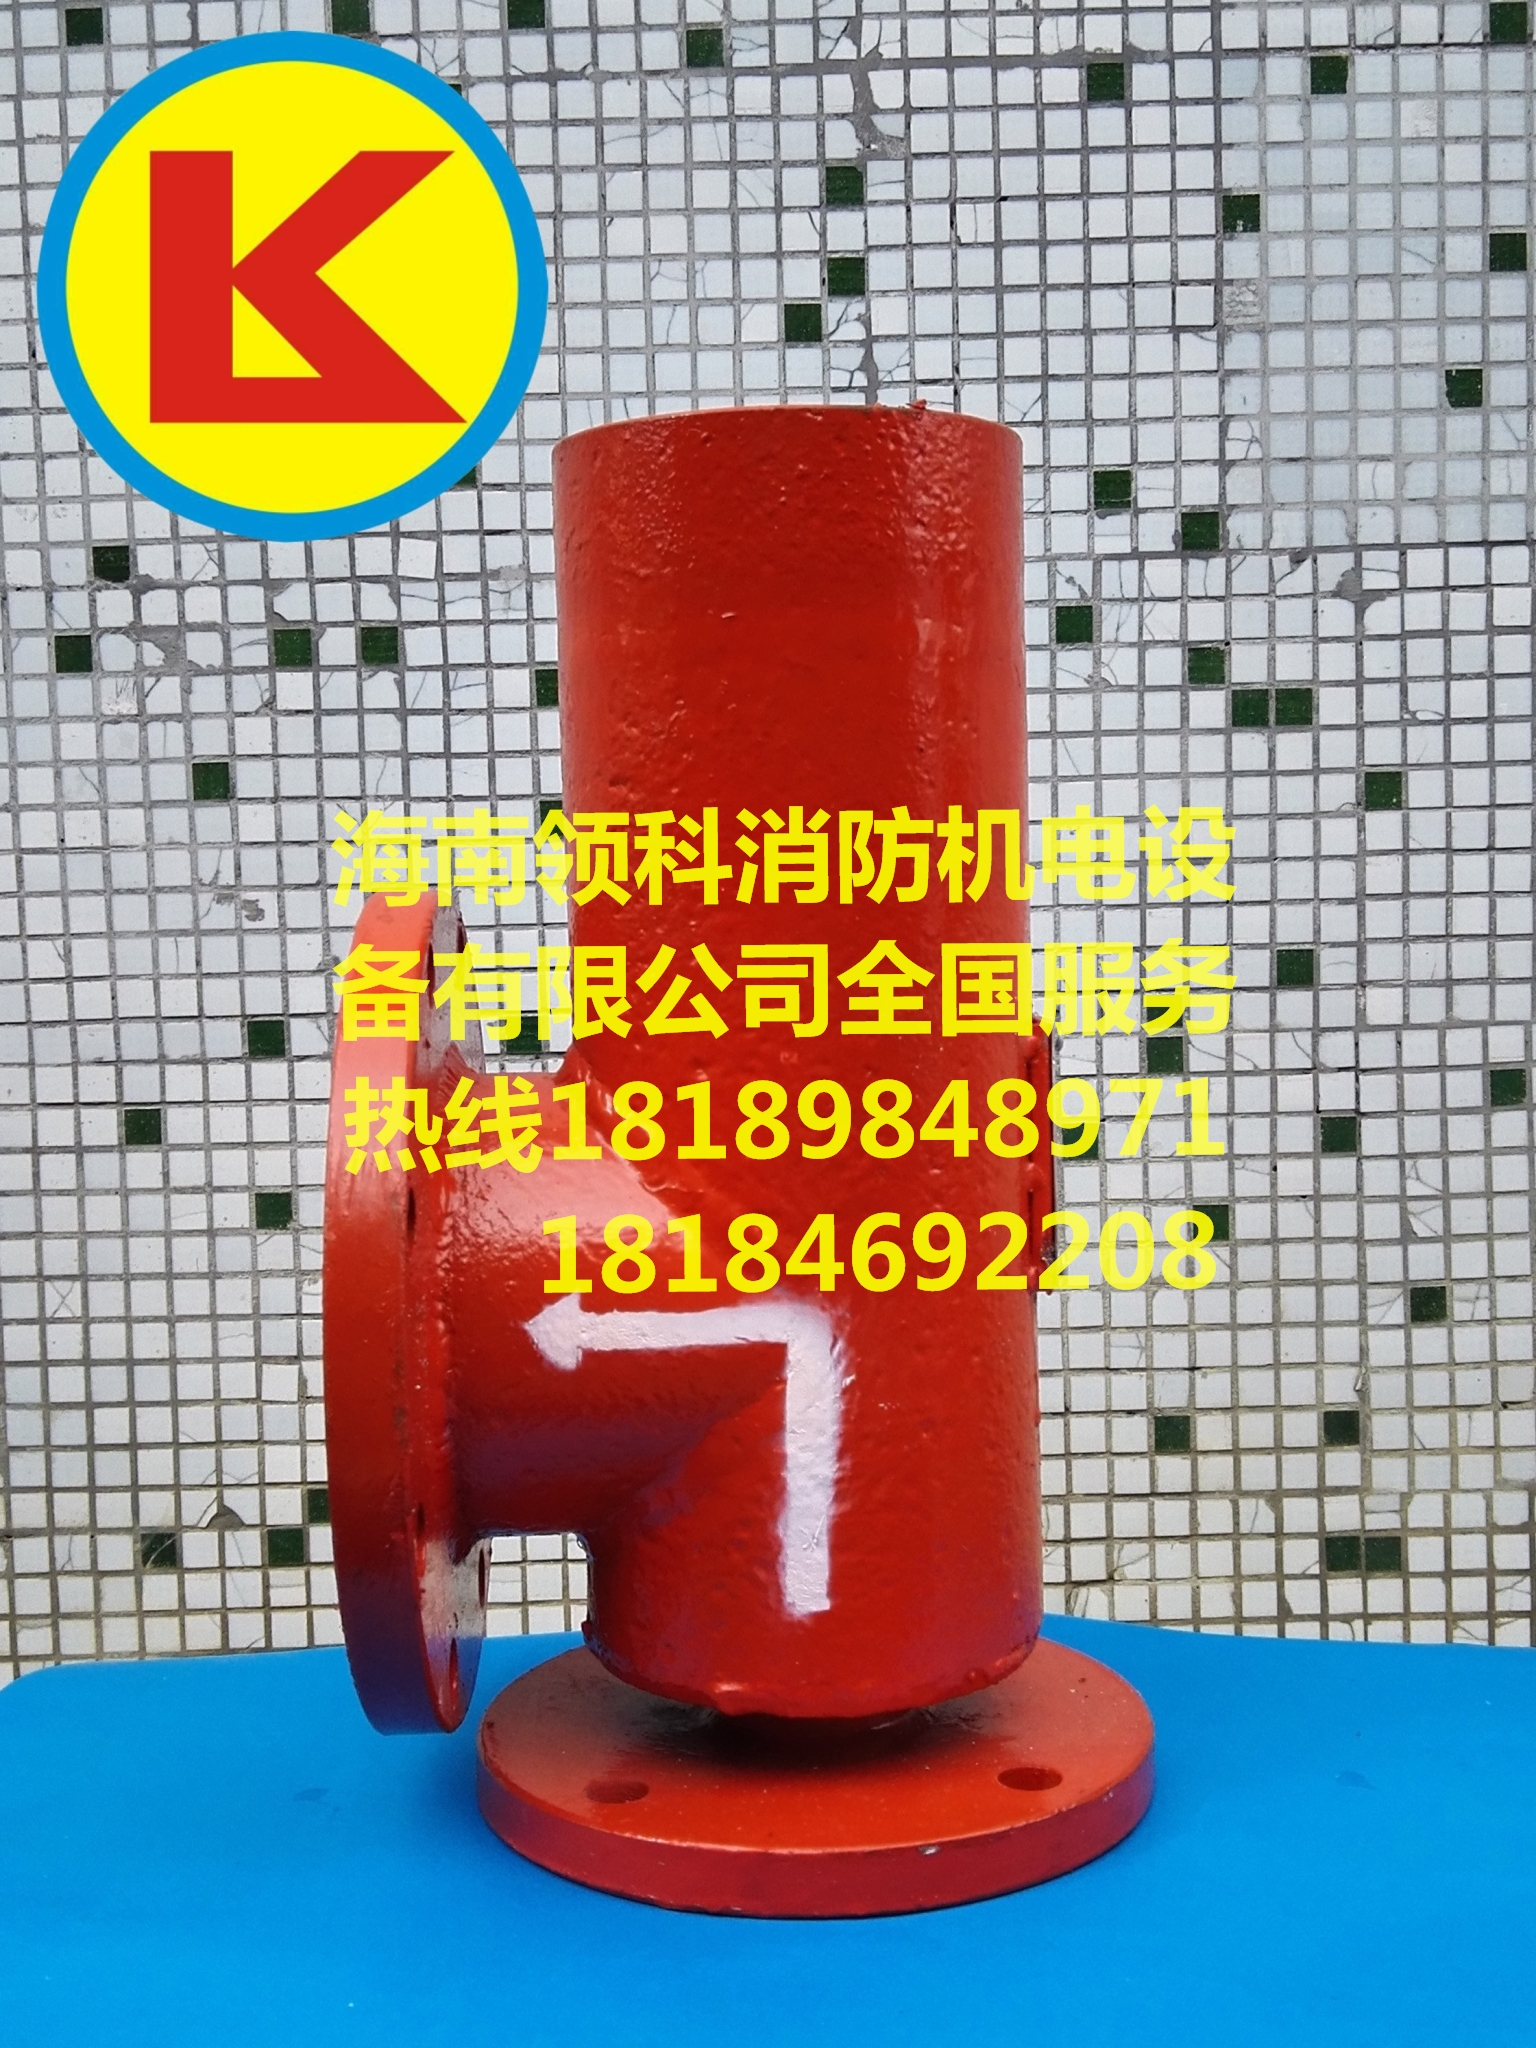 pc8空气泡沫产生器_pc8空气泡沫产生器_空气泡沫产生器_泡沫产生器_立式泡沫产生器